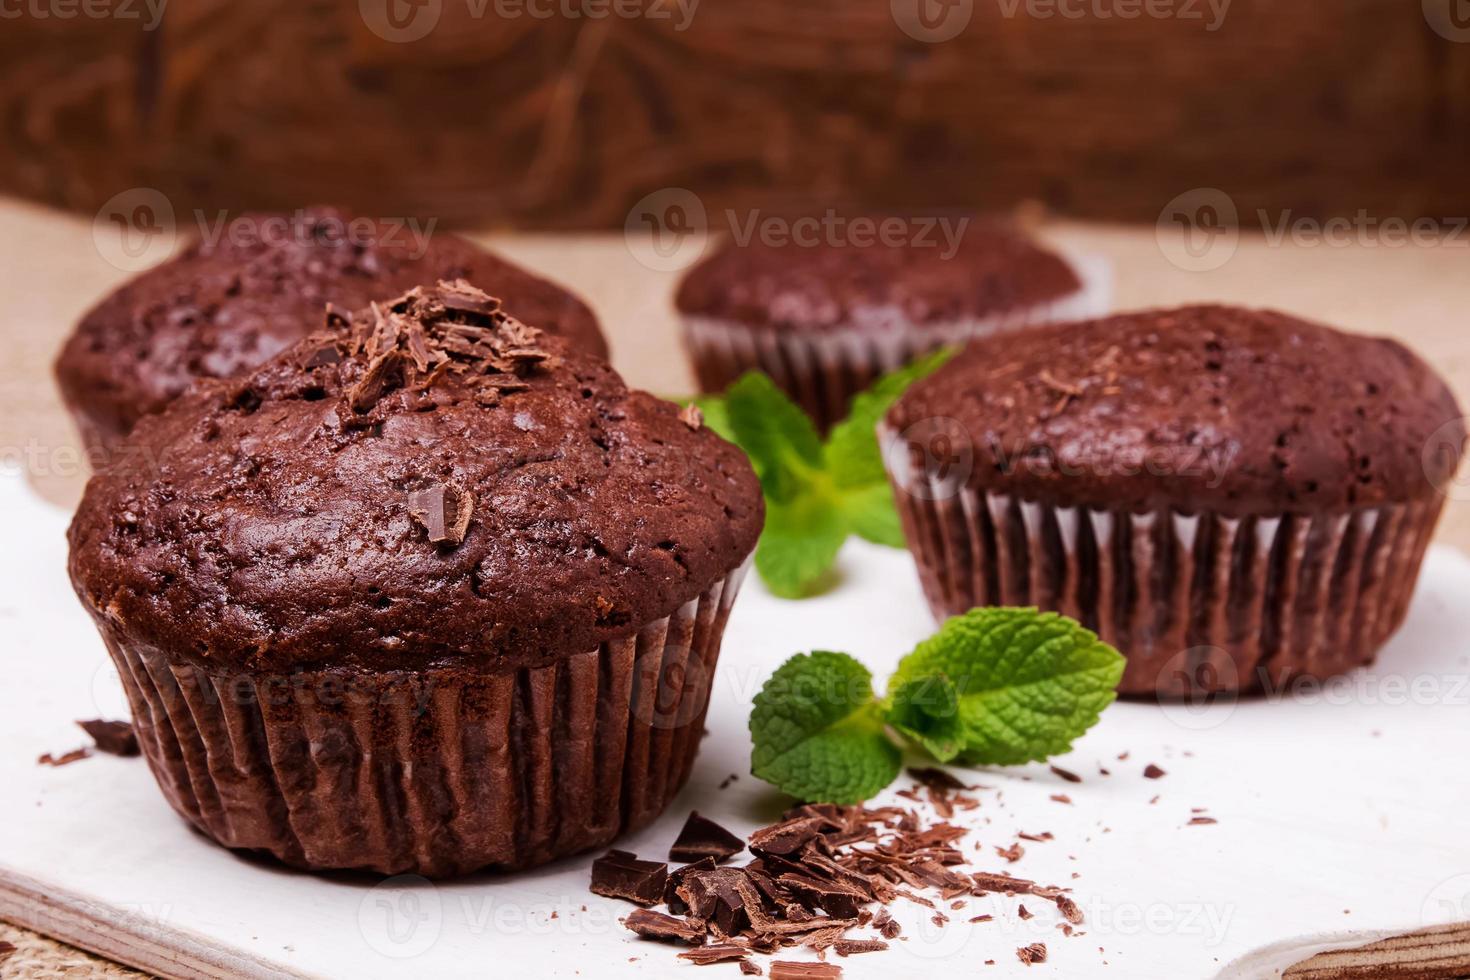 Chocolate muffins close-up photo